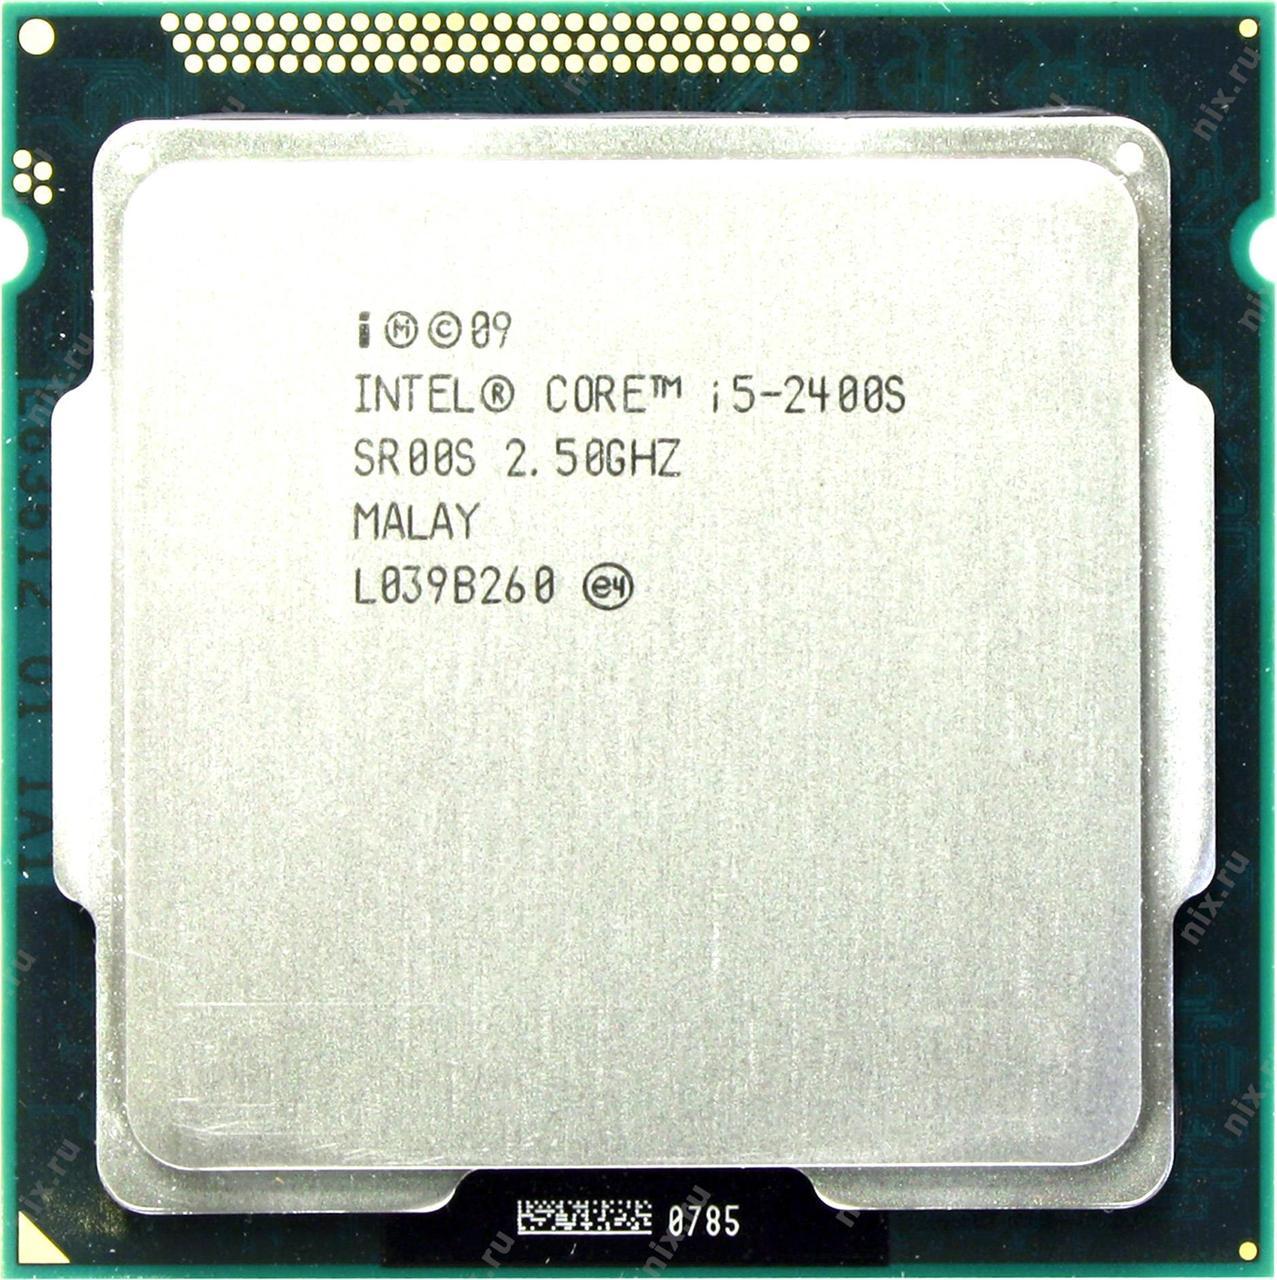 Процессор Intel Core i5 2400S 2.50GHz/6MB (BX80623I52400S) s1155 tray